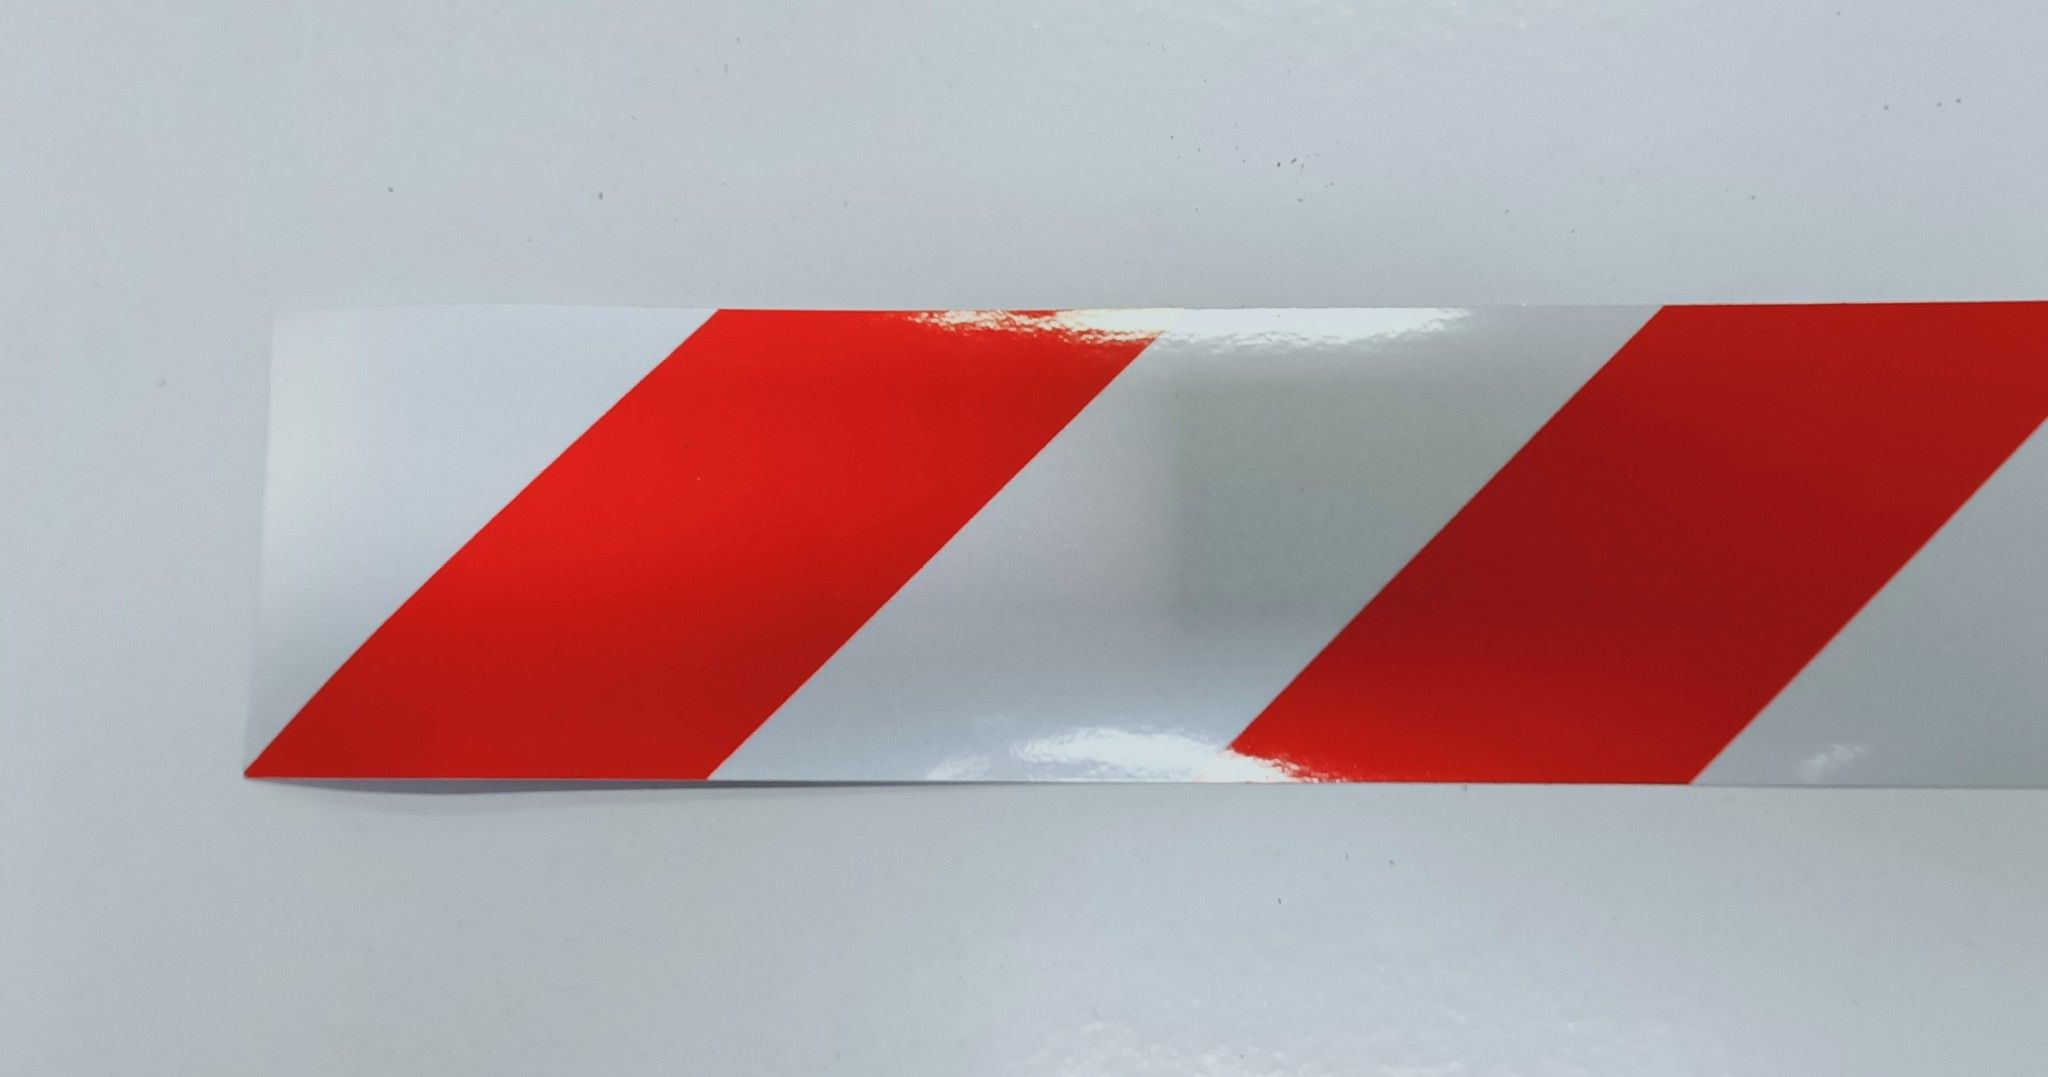 Nastro retroriflettente adesivo bianco/rosso cm 100 x 10 DM 7209